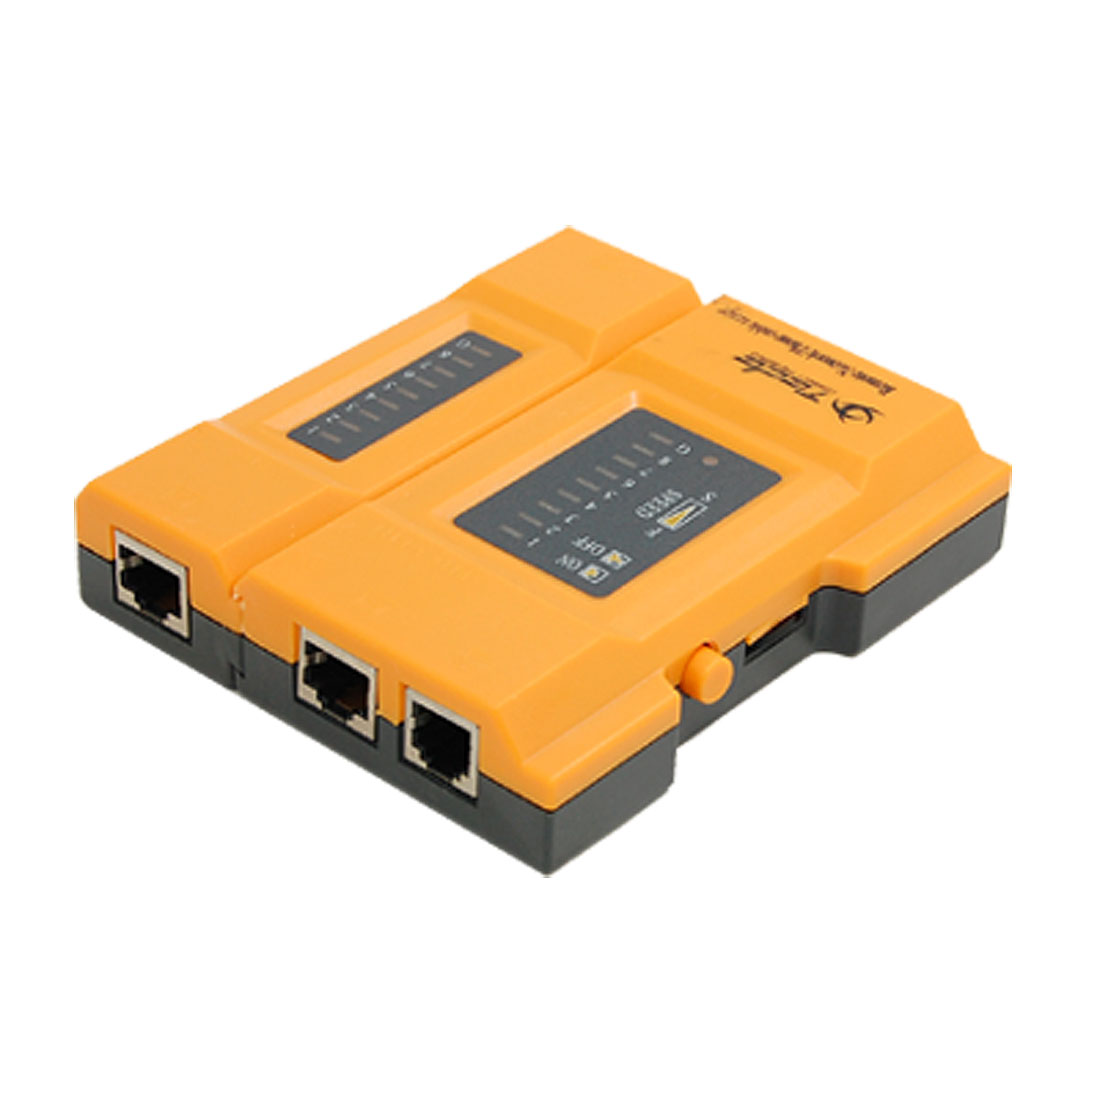 Professional RJ11 RJ45 LAN Network Phone Cable Tester